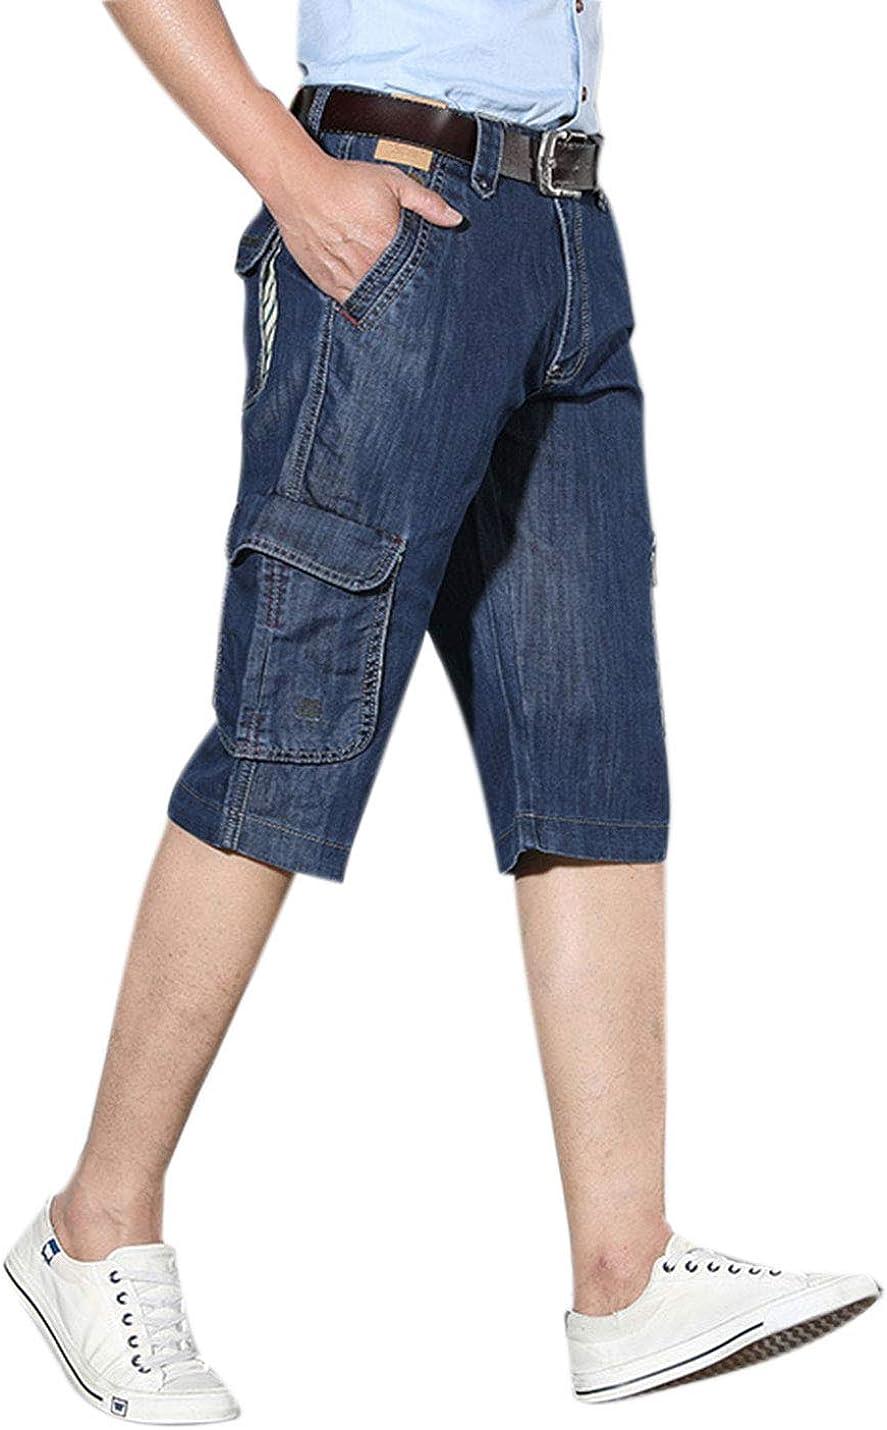 Yeokou Men's Relaxed Fit Denim Pockets Cargo Jeans Bermuda Shorts Capri Pants